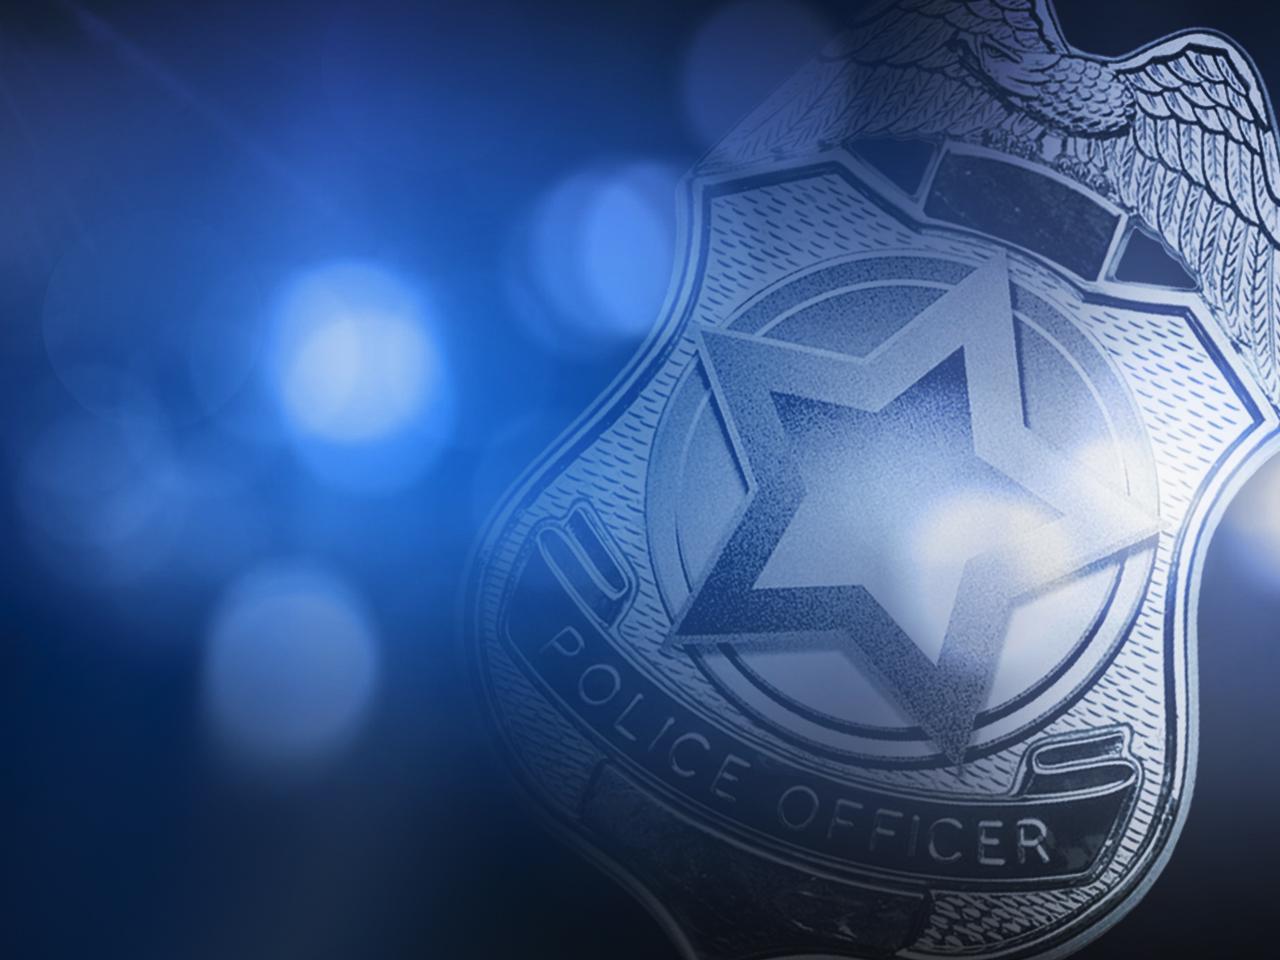 police badgee_1539829610263.jpg.jpg